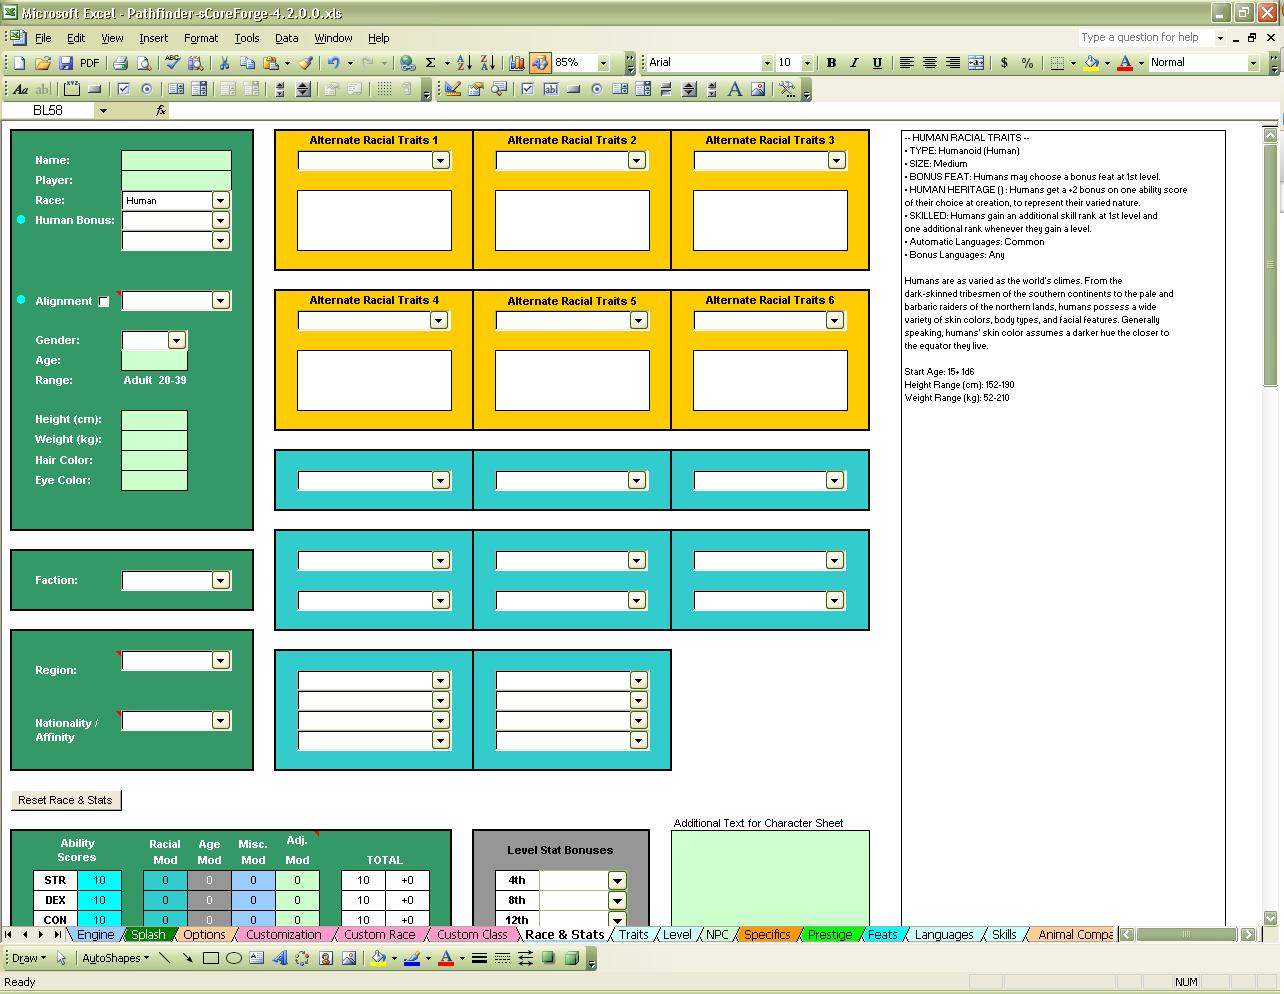 Pathfinder Downtime Spreadsheet In Nikki: Scoreforge Pathfinder Character Creator Download